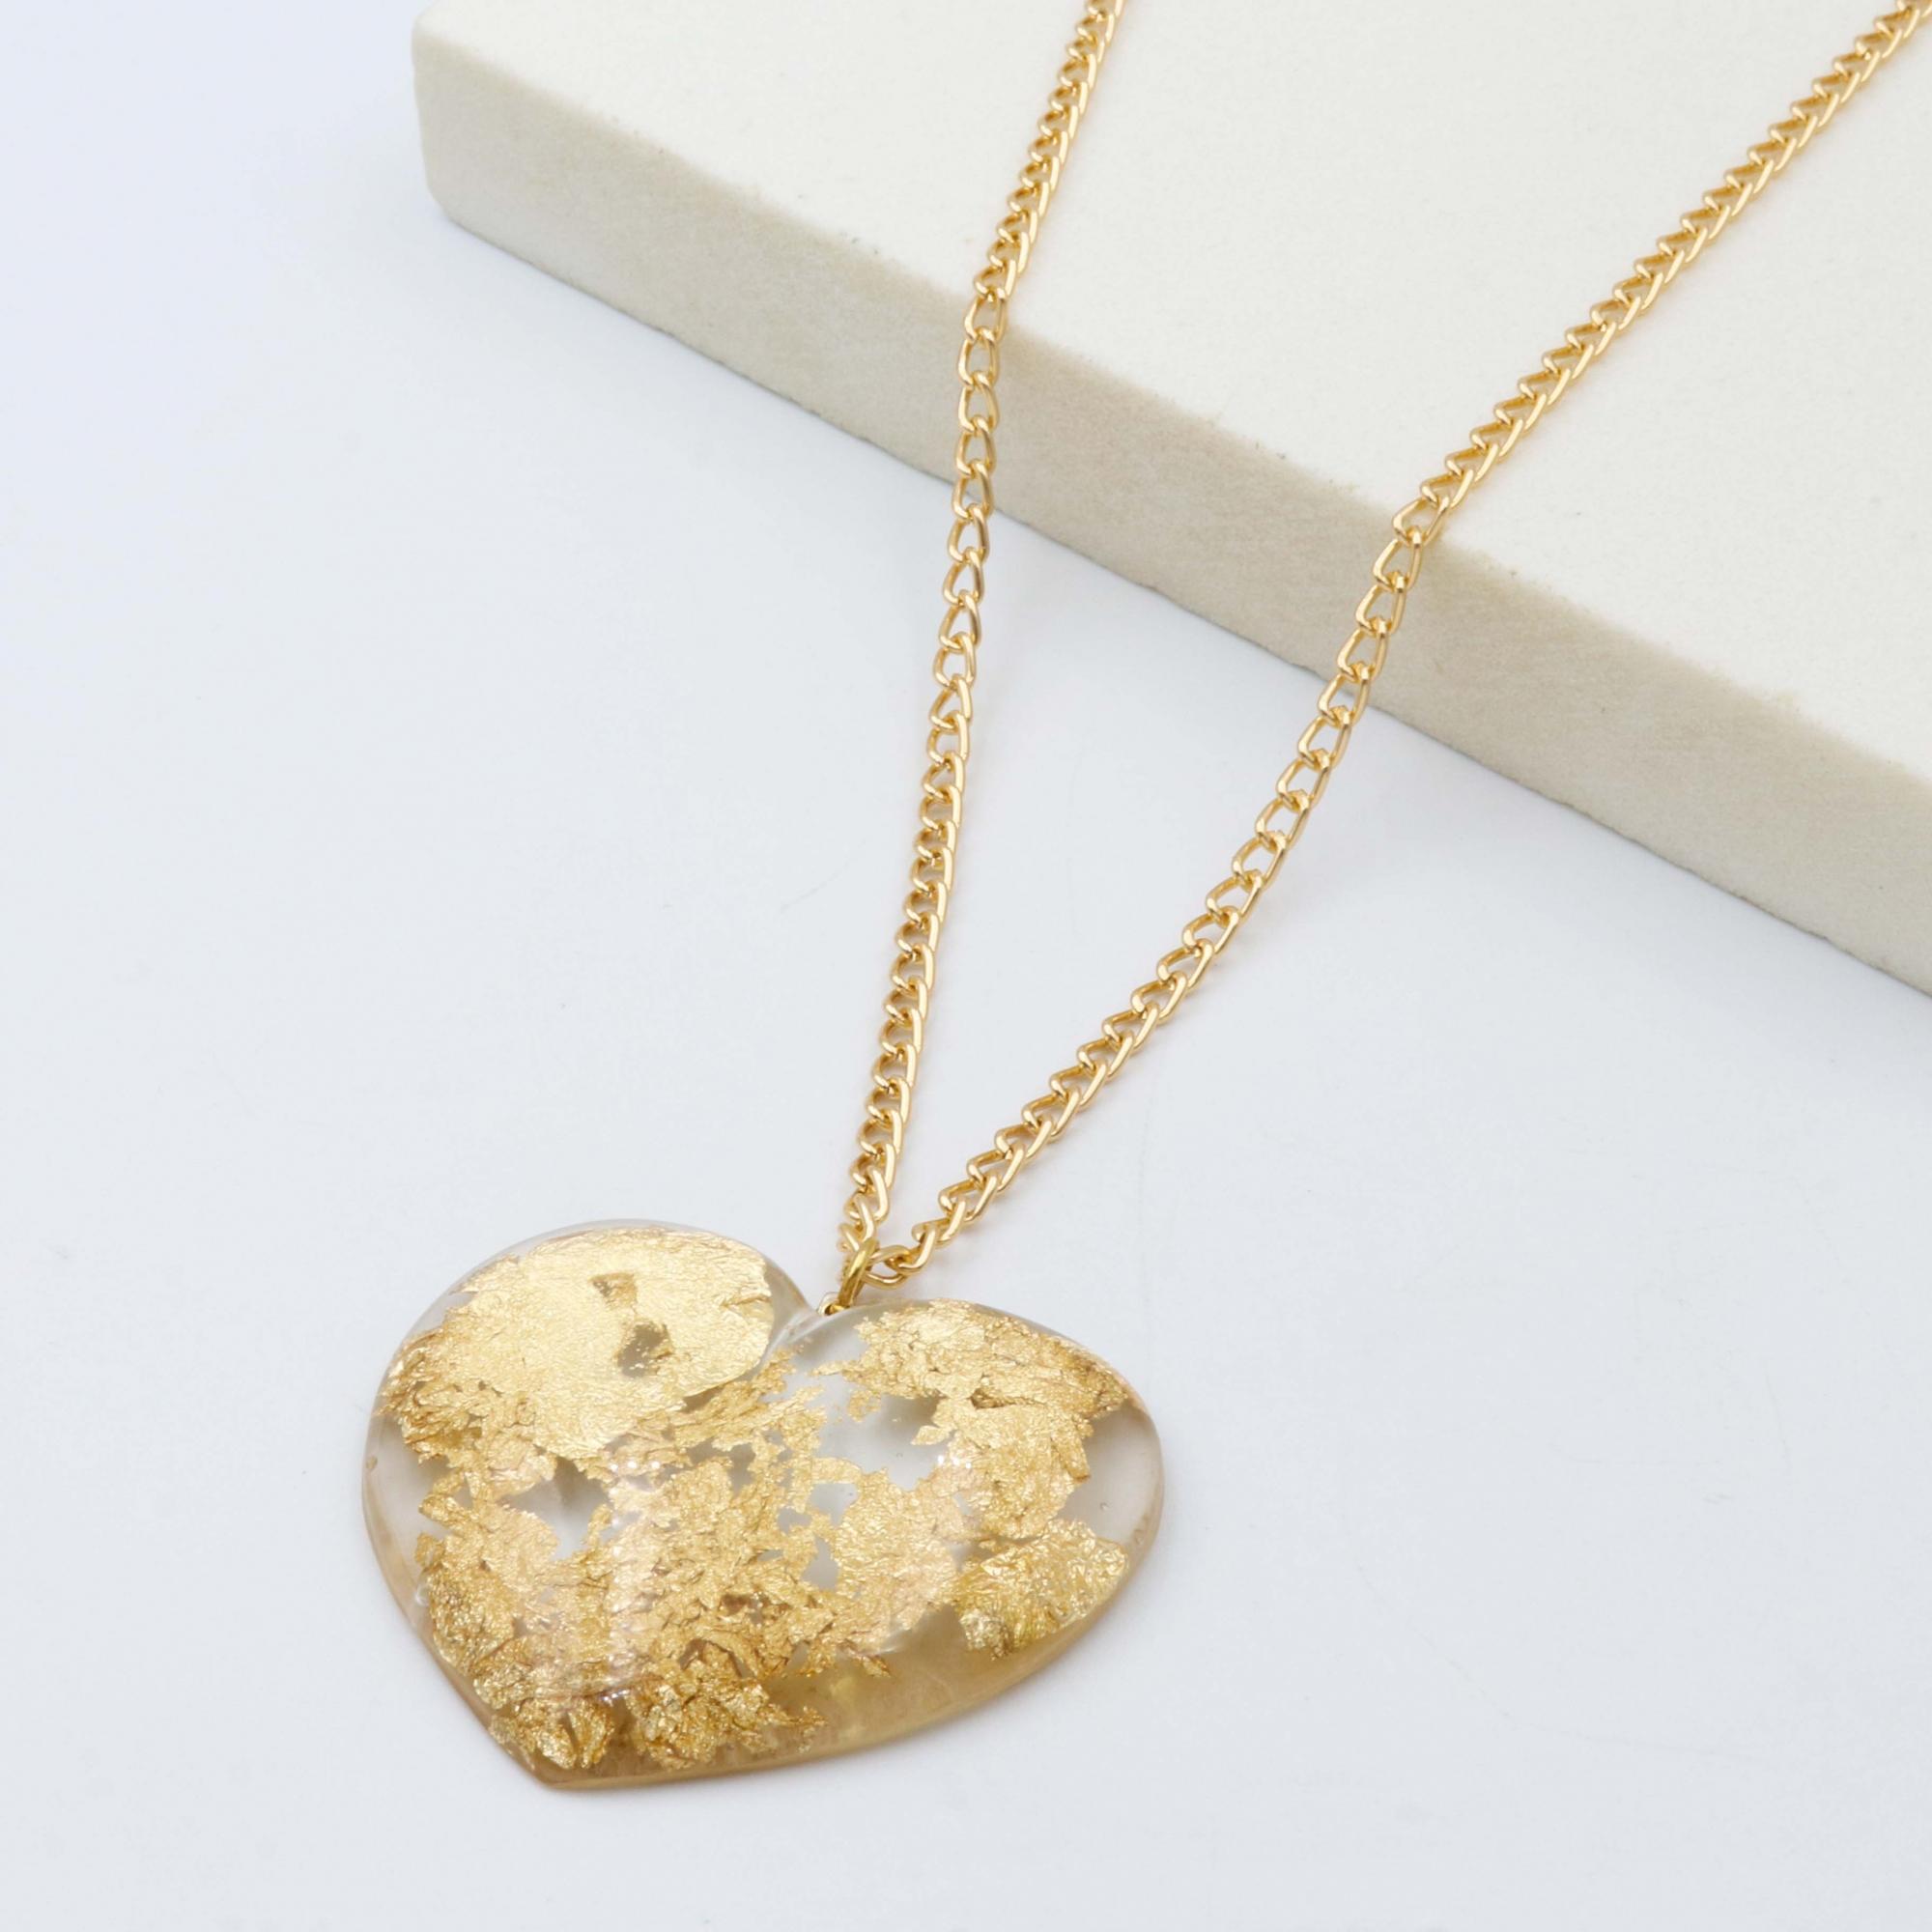 COLAR GOLDEN HEART - TRANSPARENTE